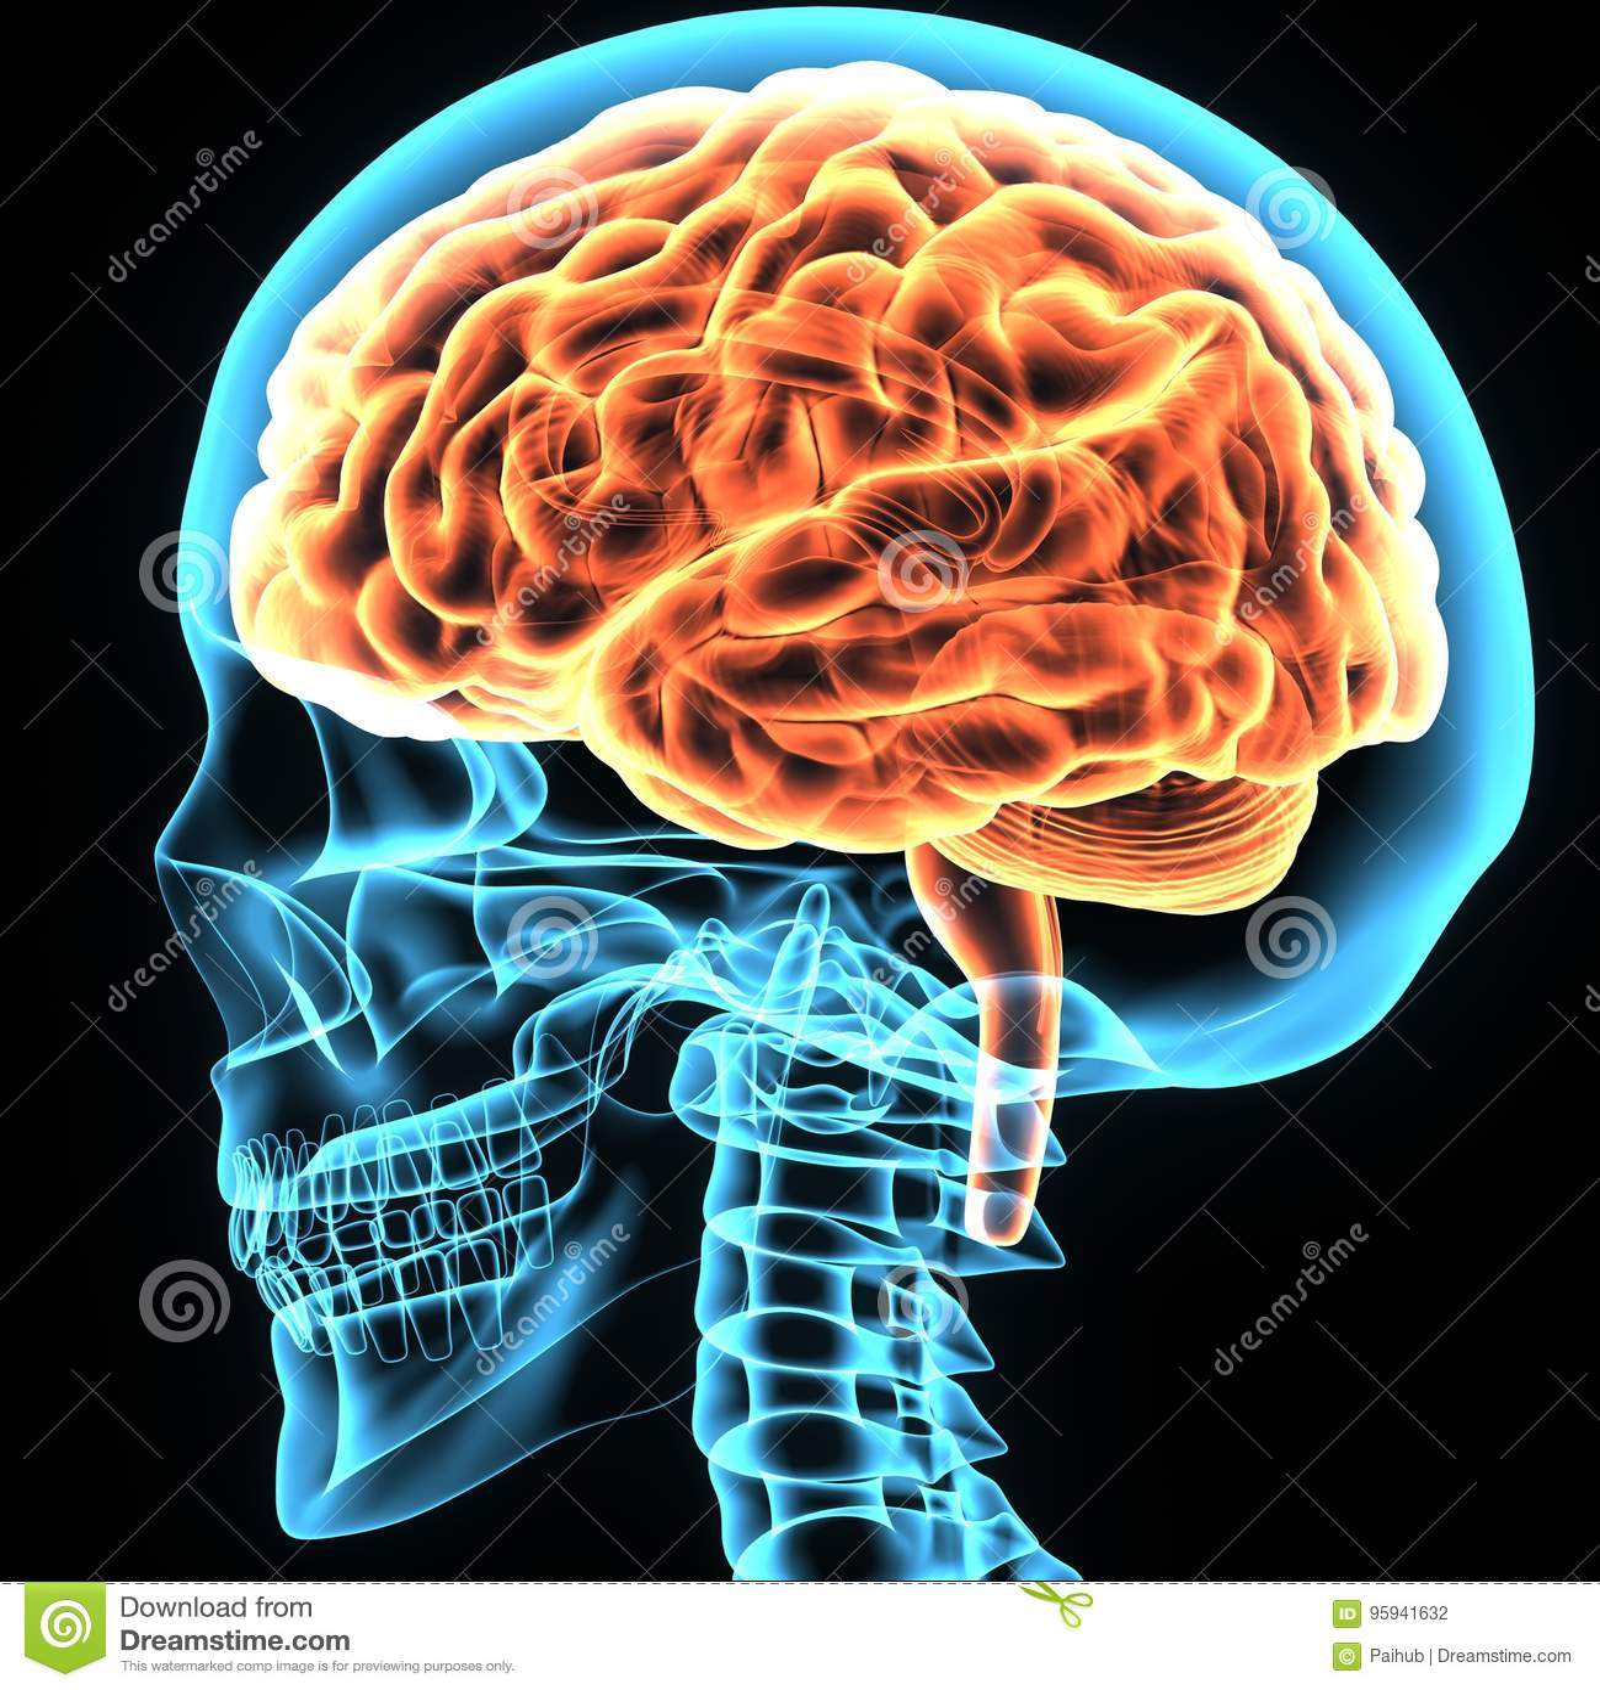 3d Illustration Of Human Body Brain Anatomy Stock Illustration